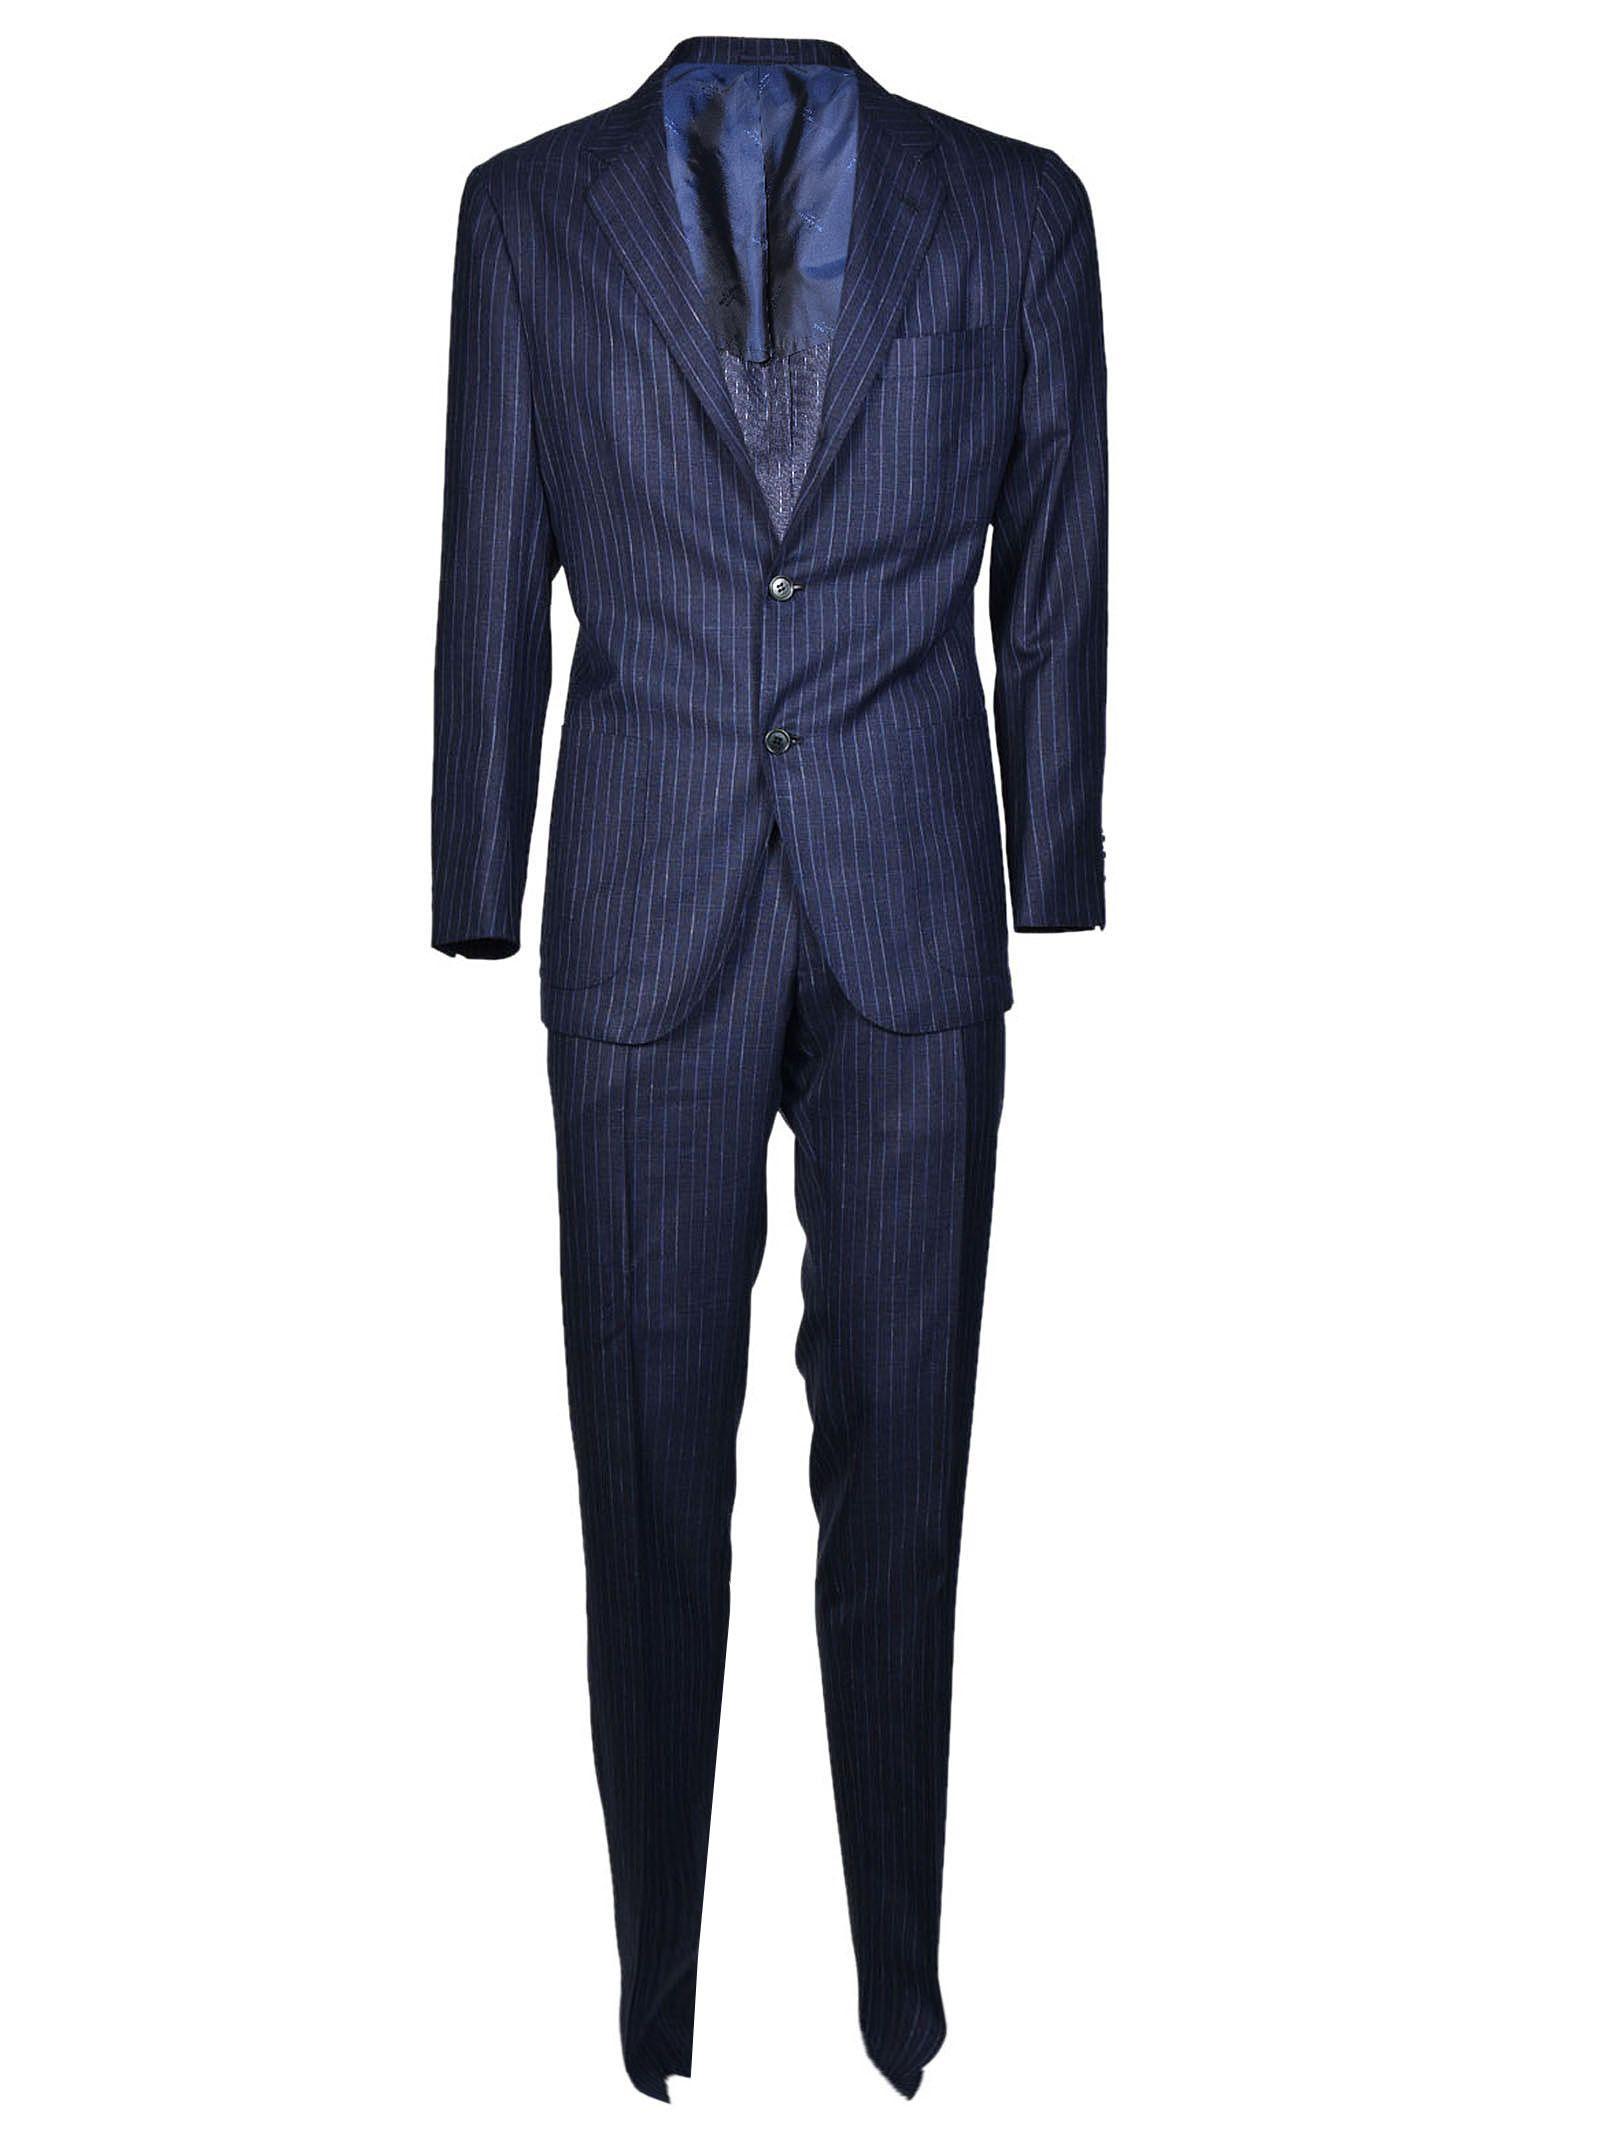 Kiton Pinstripe Suit